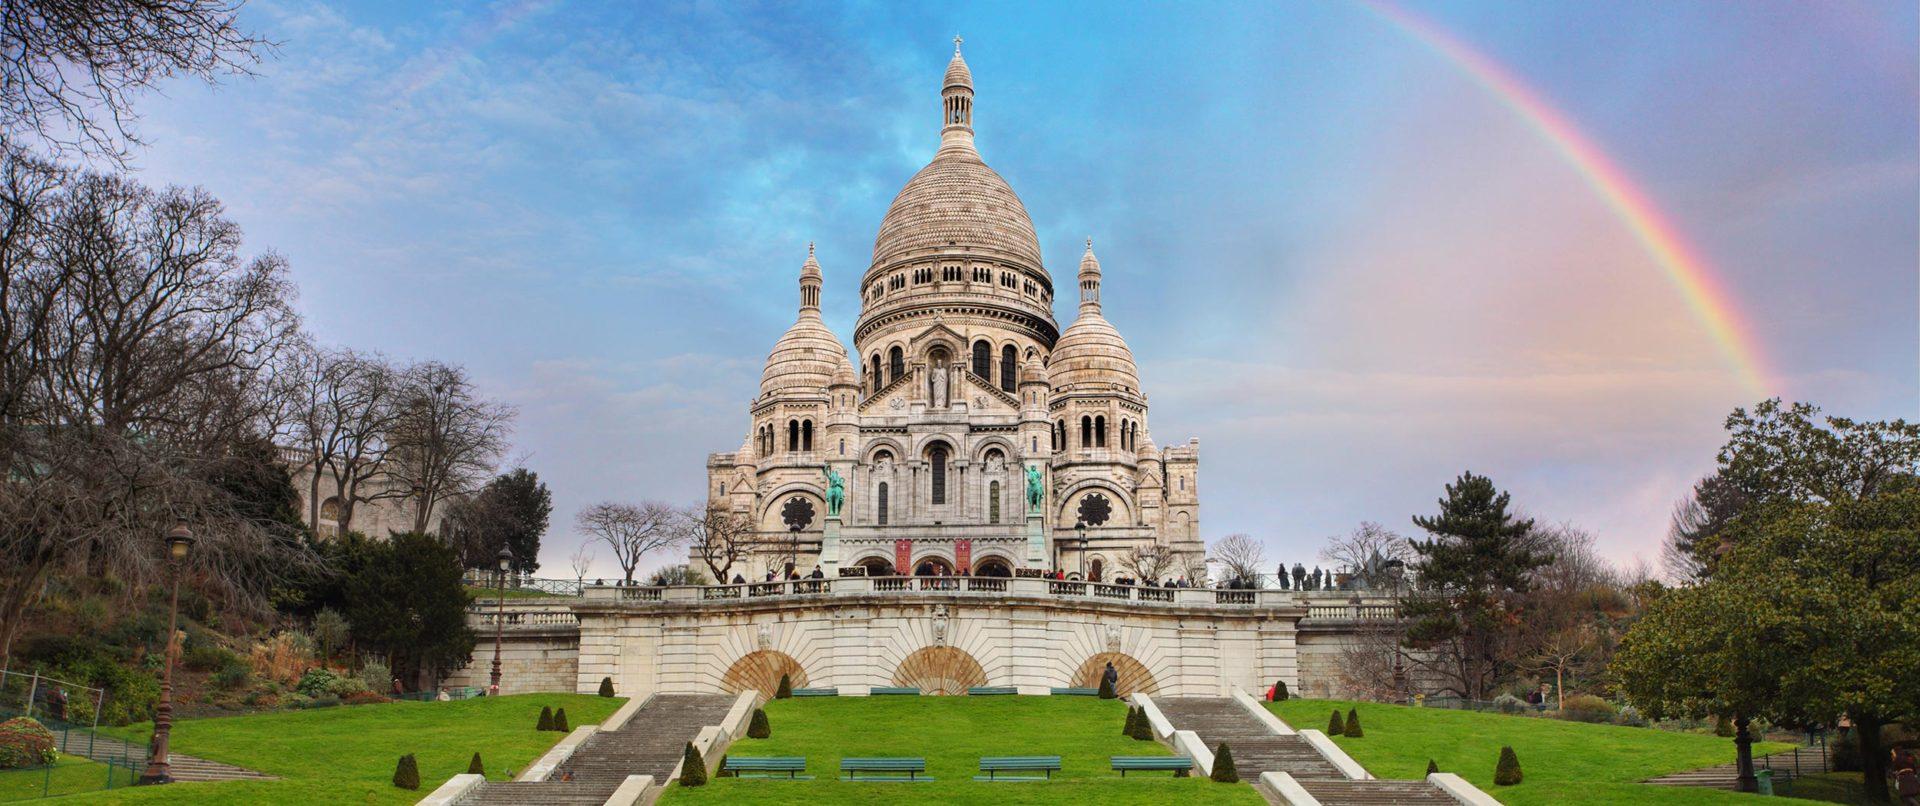 montmartre-Inquiry-Tour-Sacre-coeur